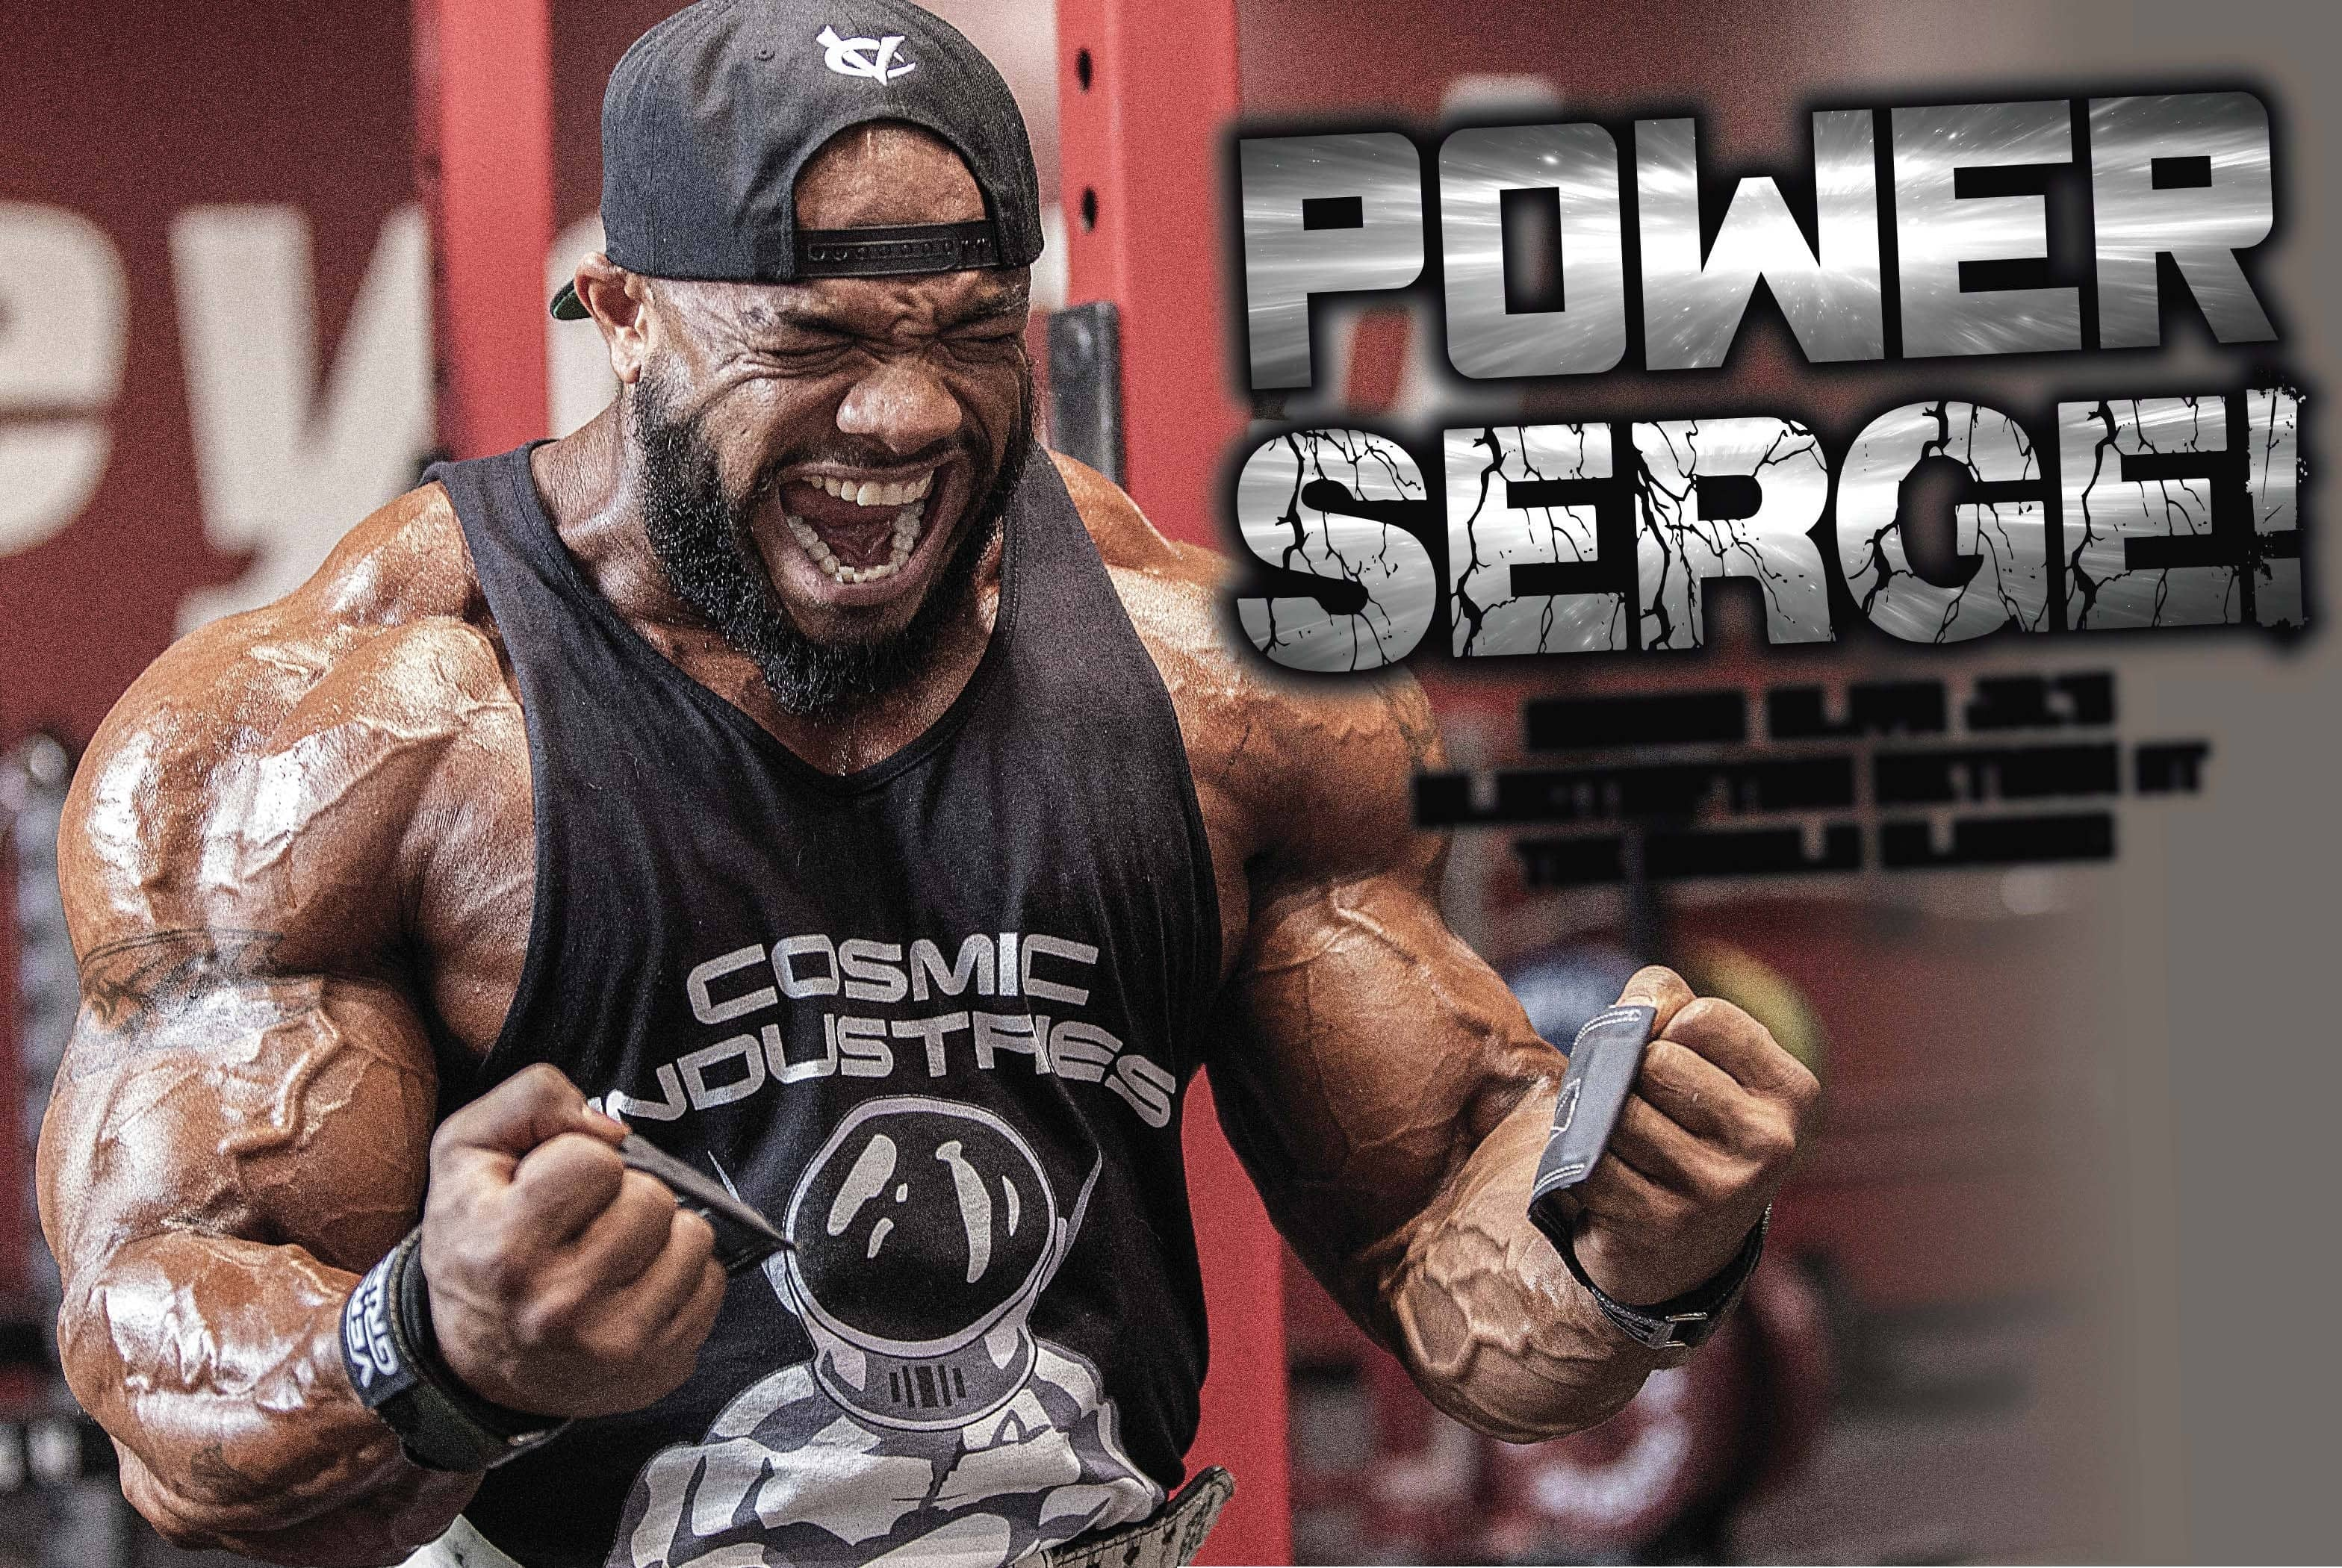 POWER SERGE!